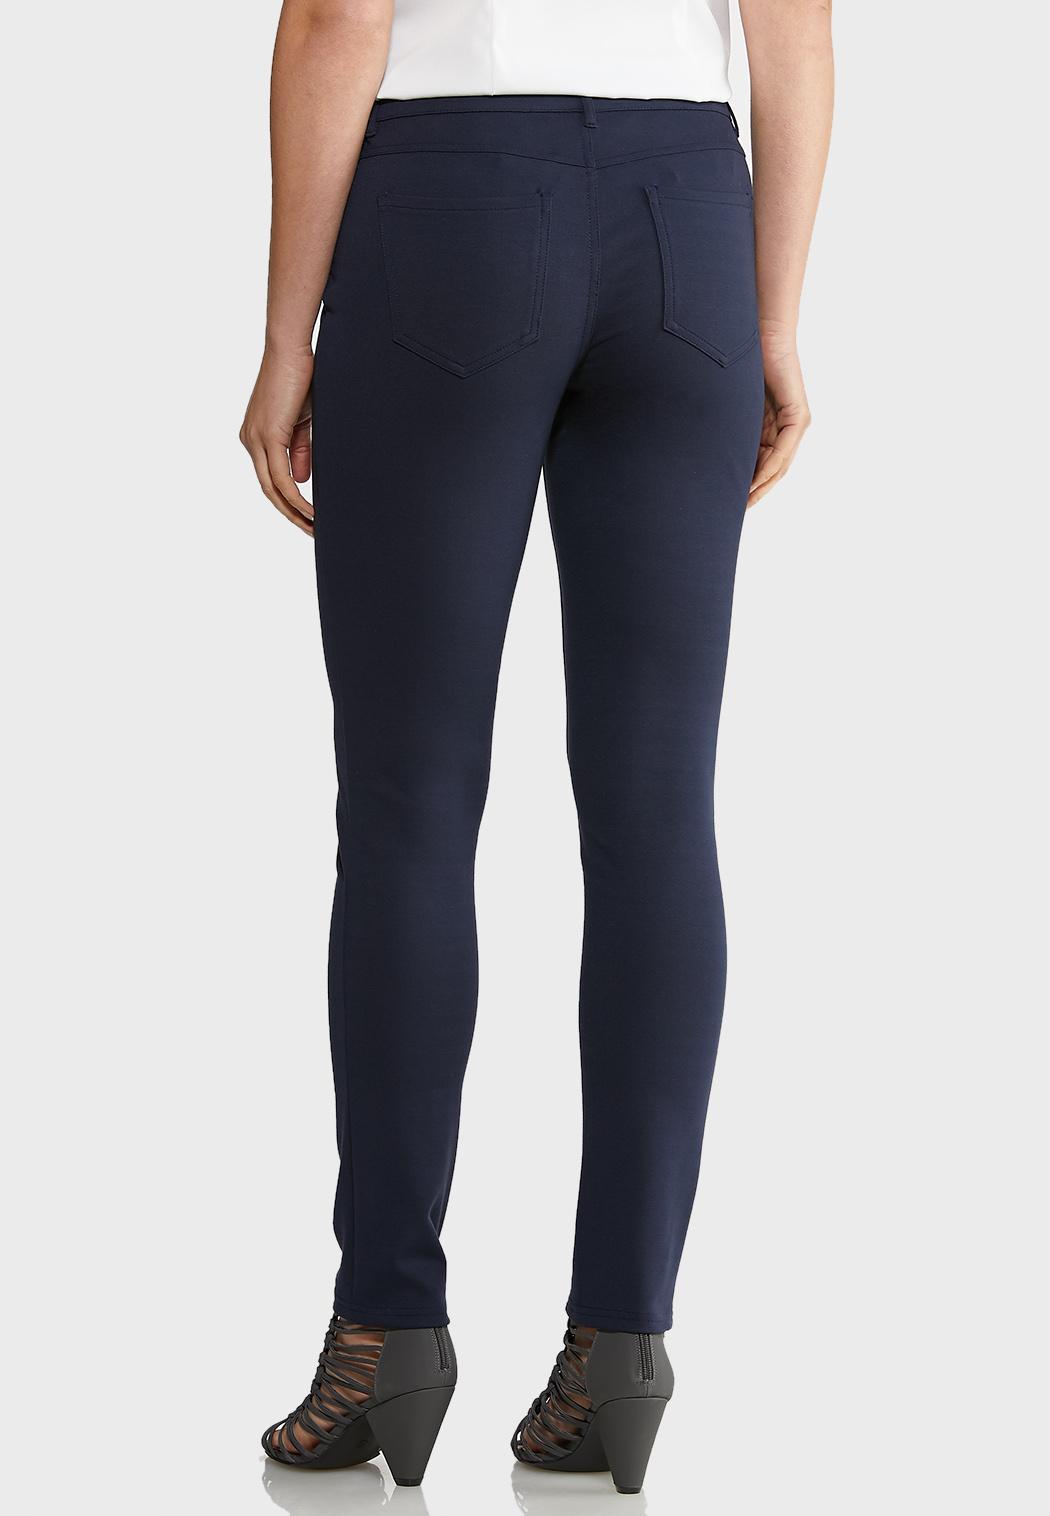 Skinny Leg Ponte Pants (Item #43917604)